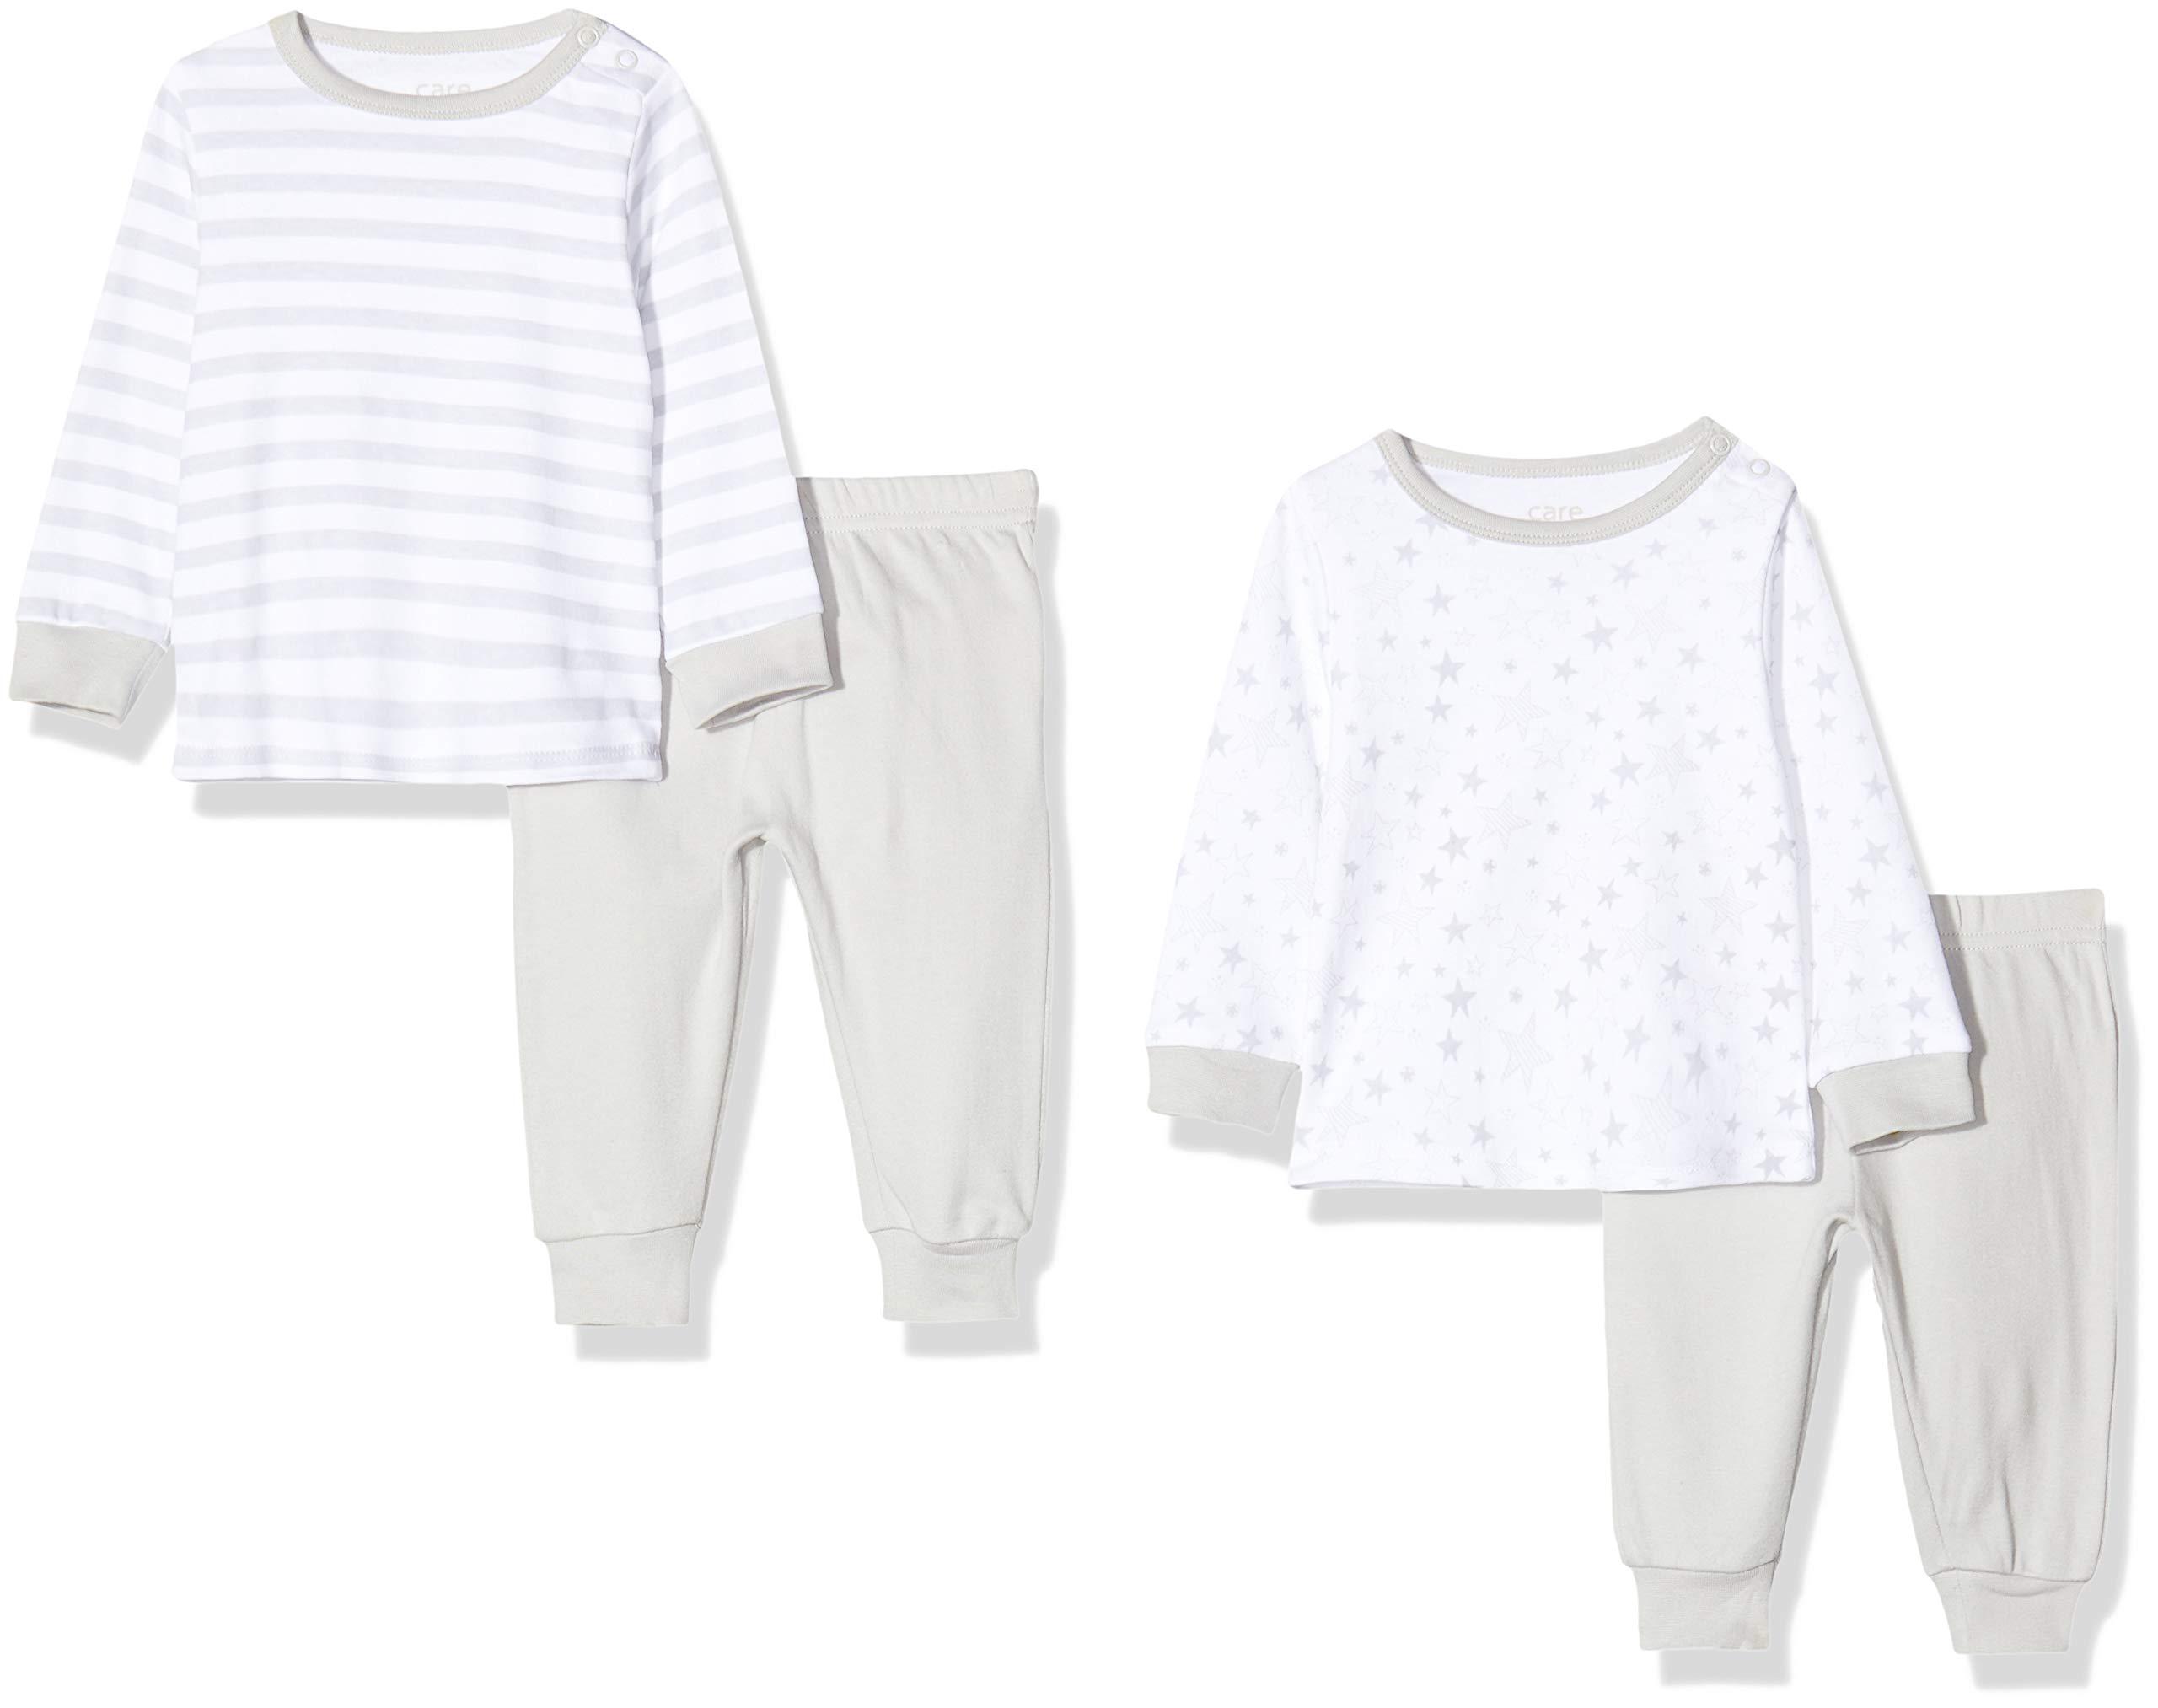 550270 - Ensemble De Pyjama - Mixte bébé